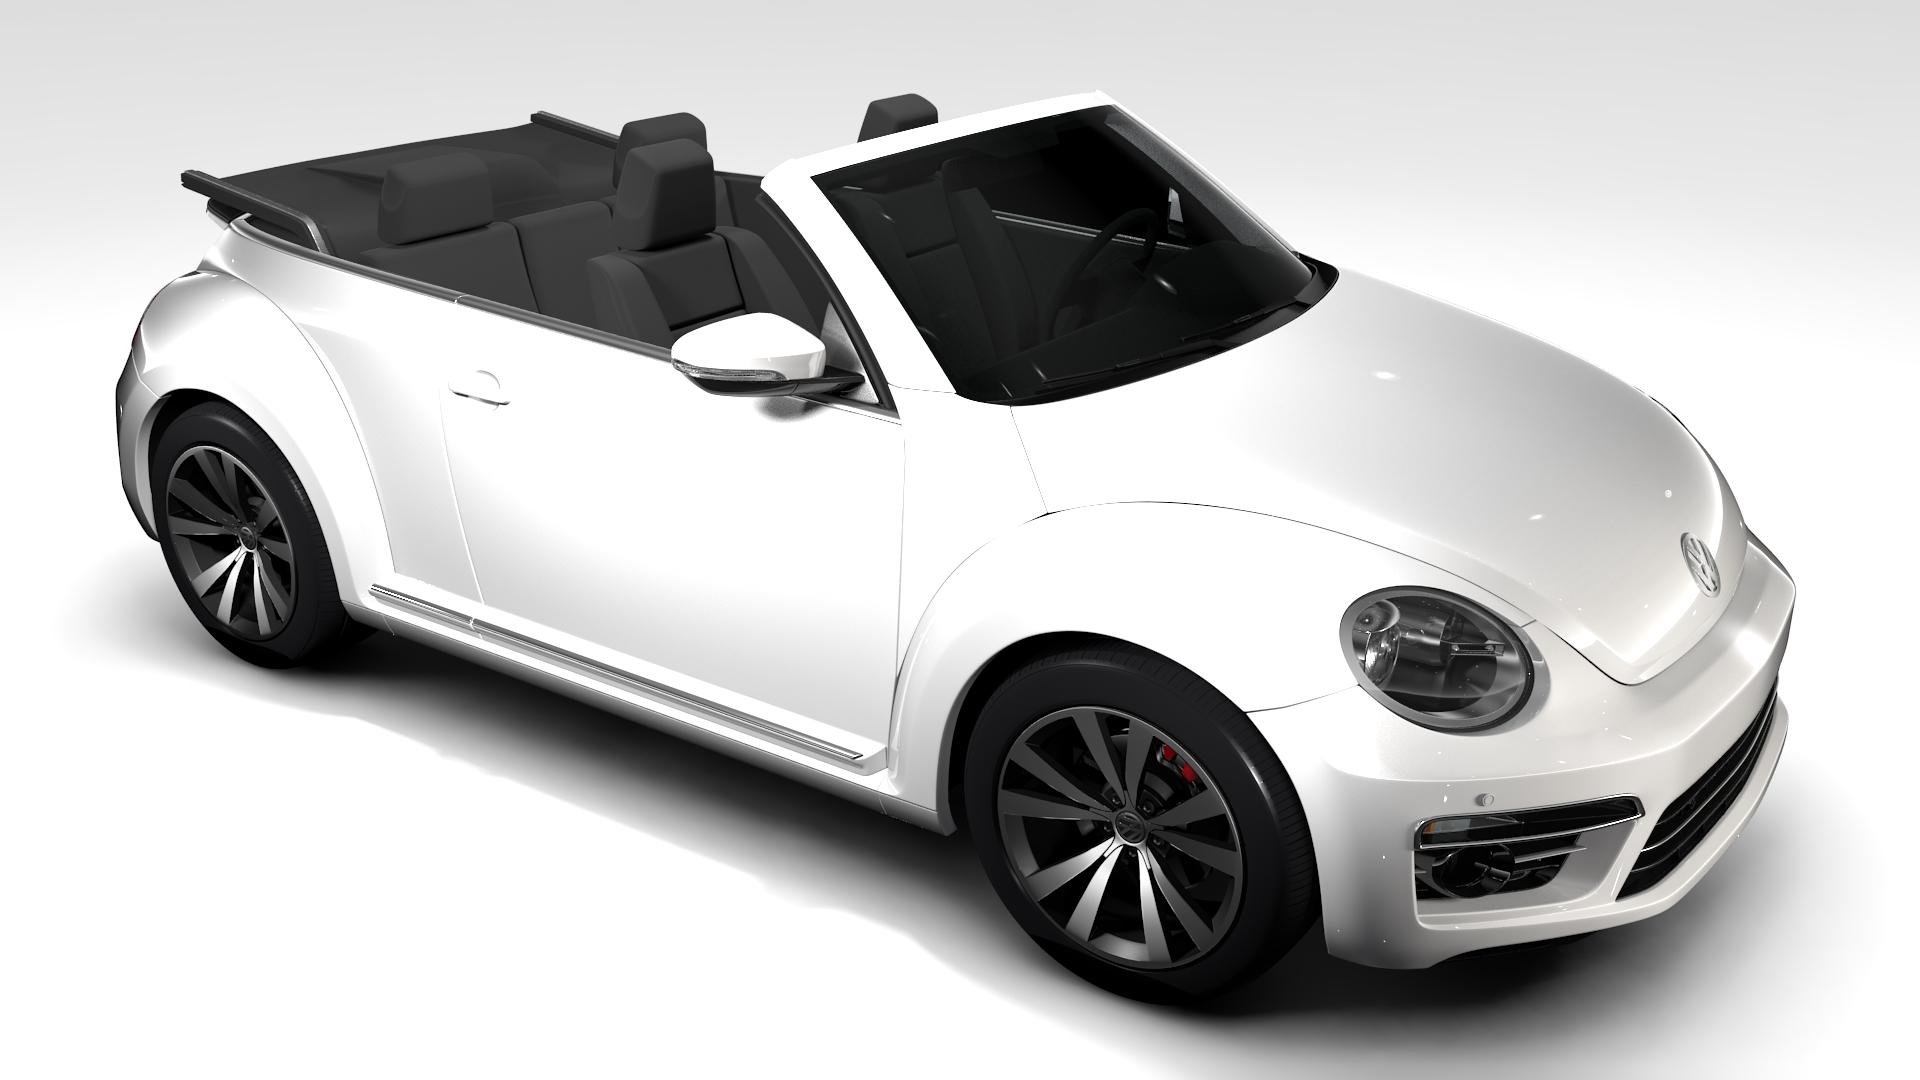 vw beetle cabriolet 2017 3d model 3ds max fbx c4d lwo ma mb hrc xsi obj 221599